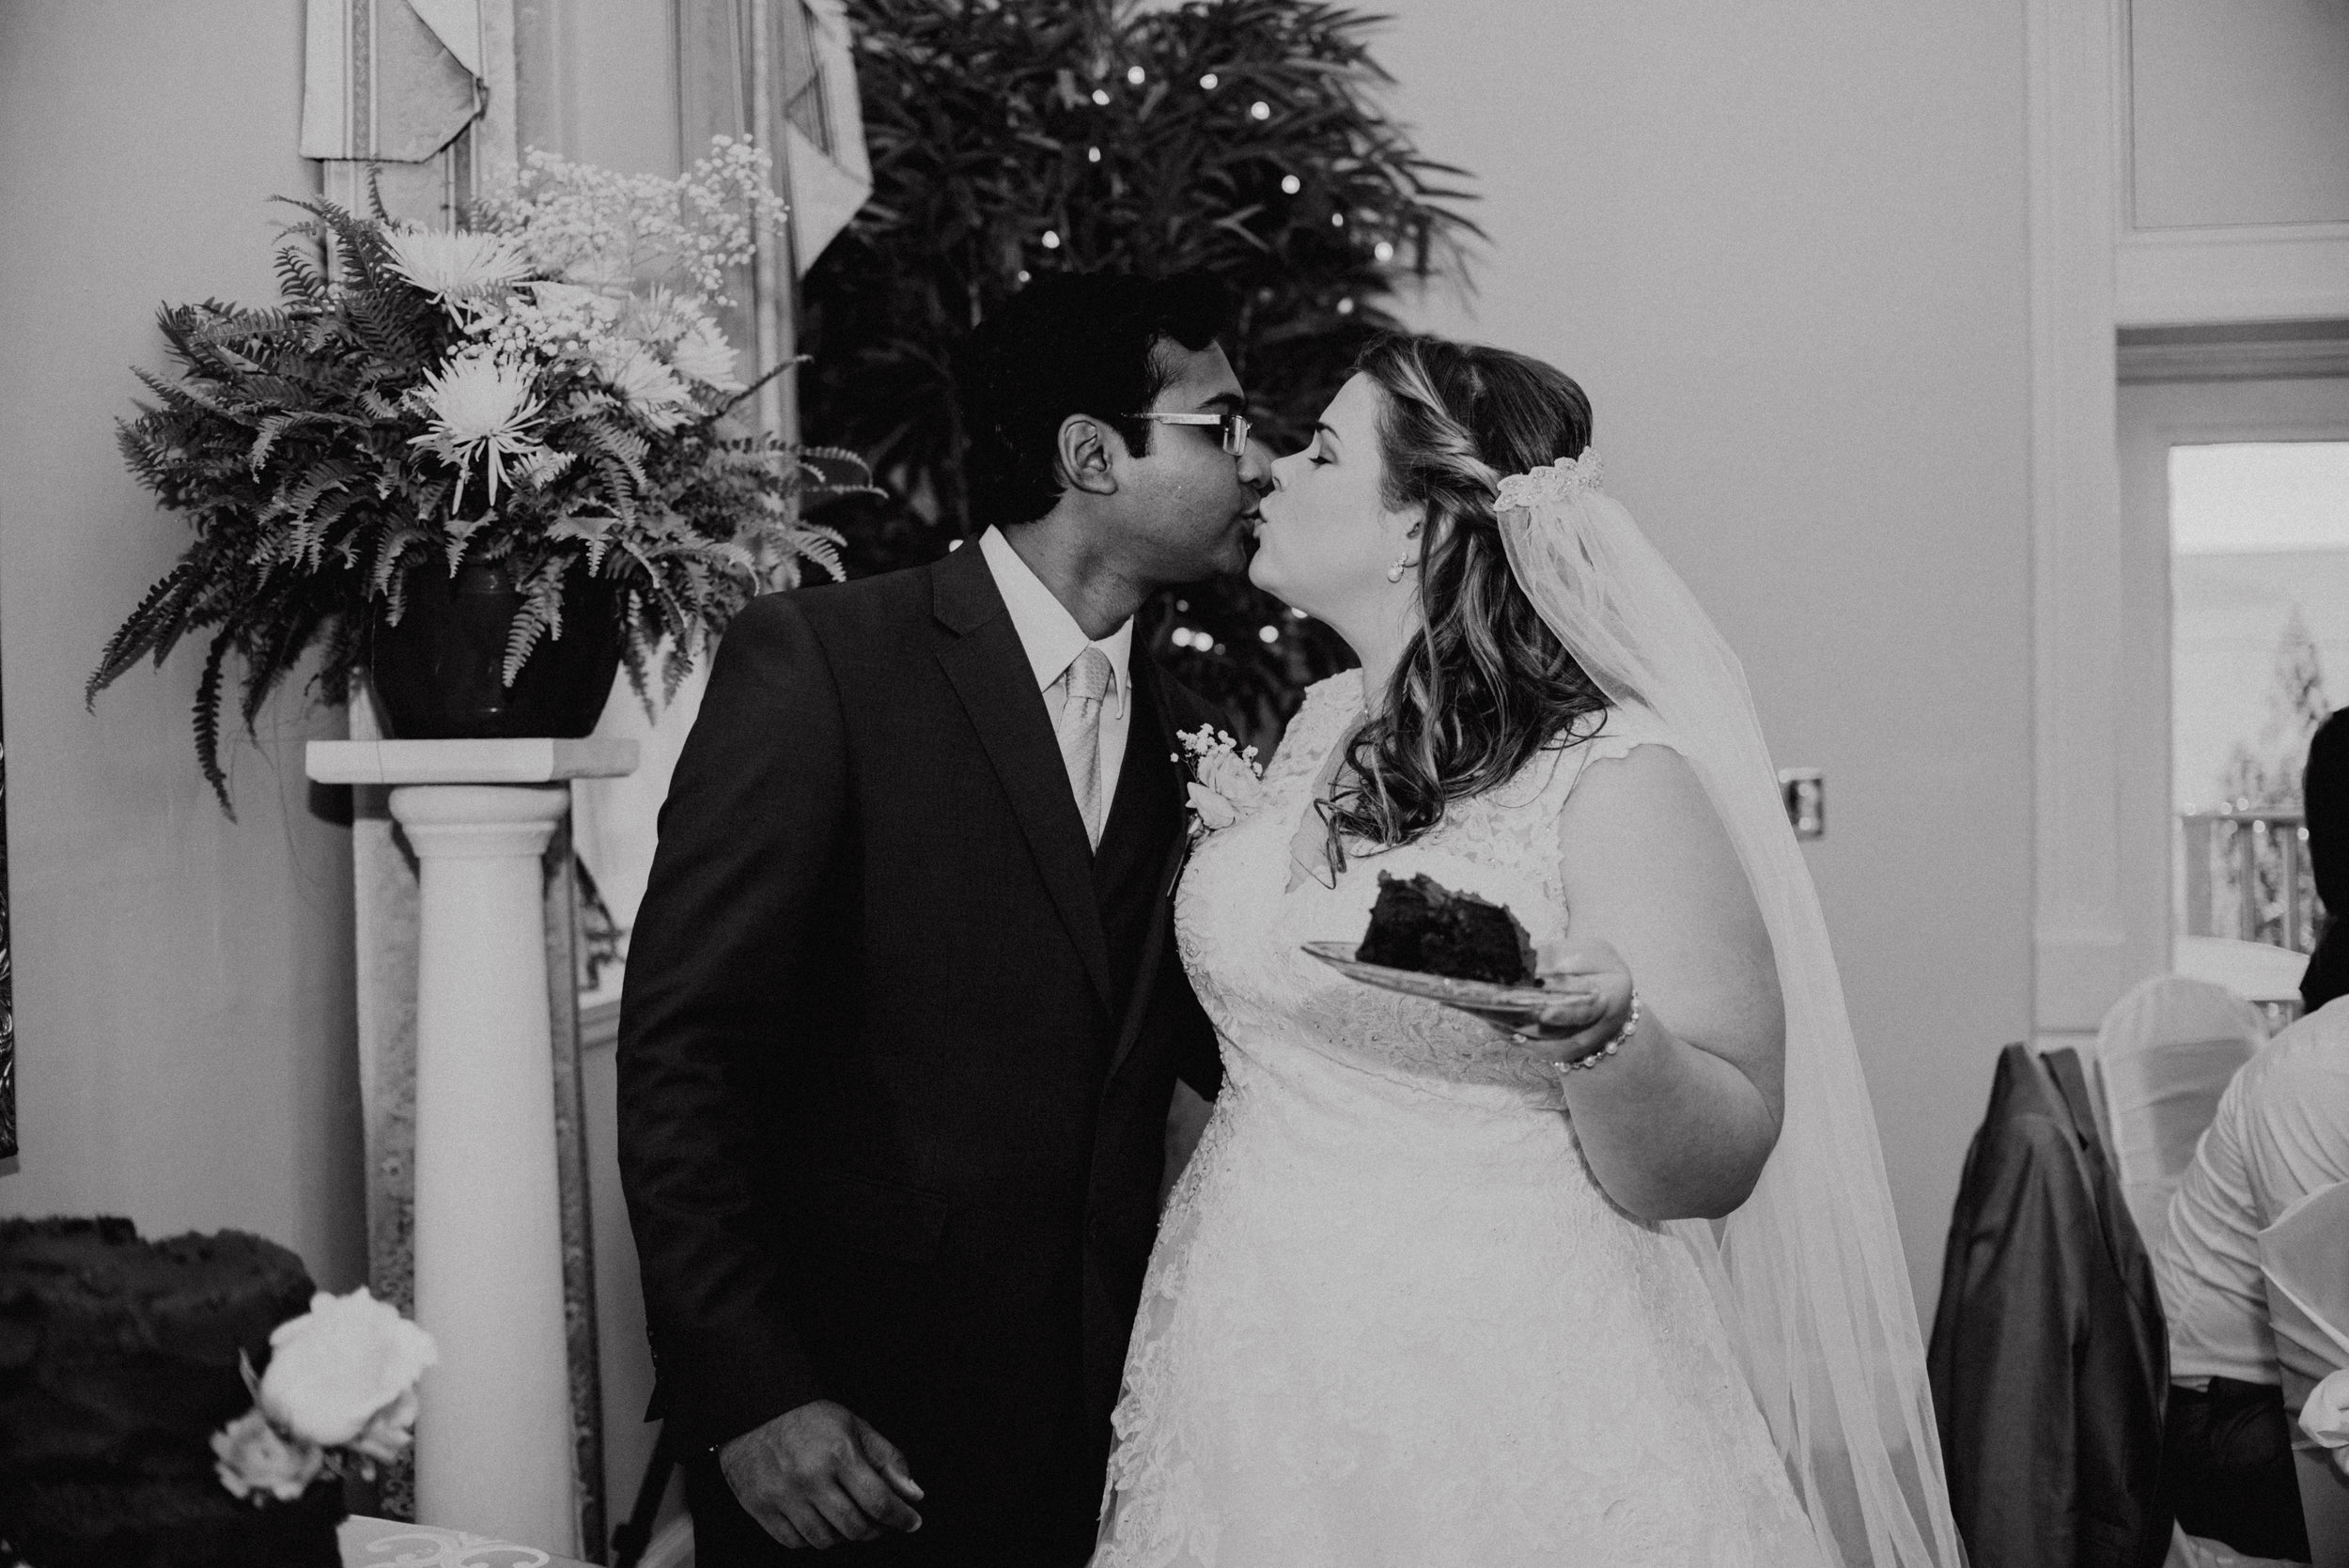 WonderlyCreative_Wedding_5.12.18_Megan&Swapnil_-972.jpg